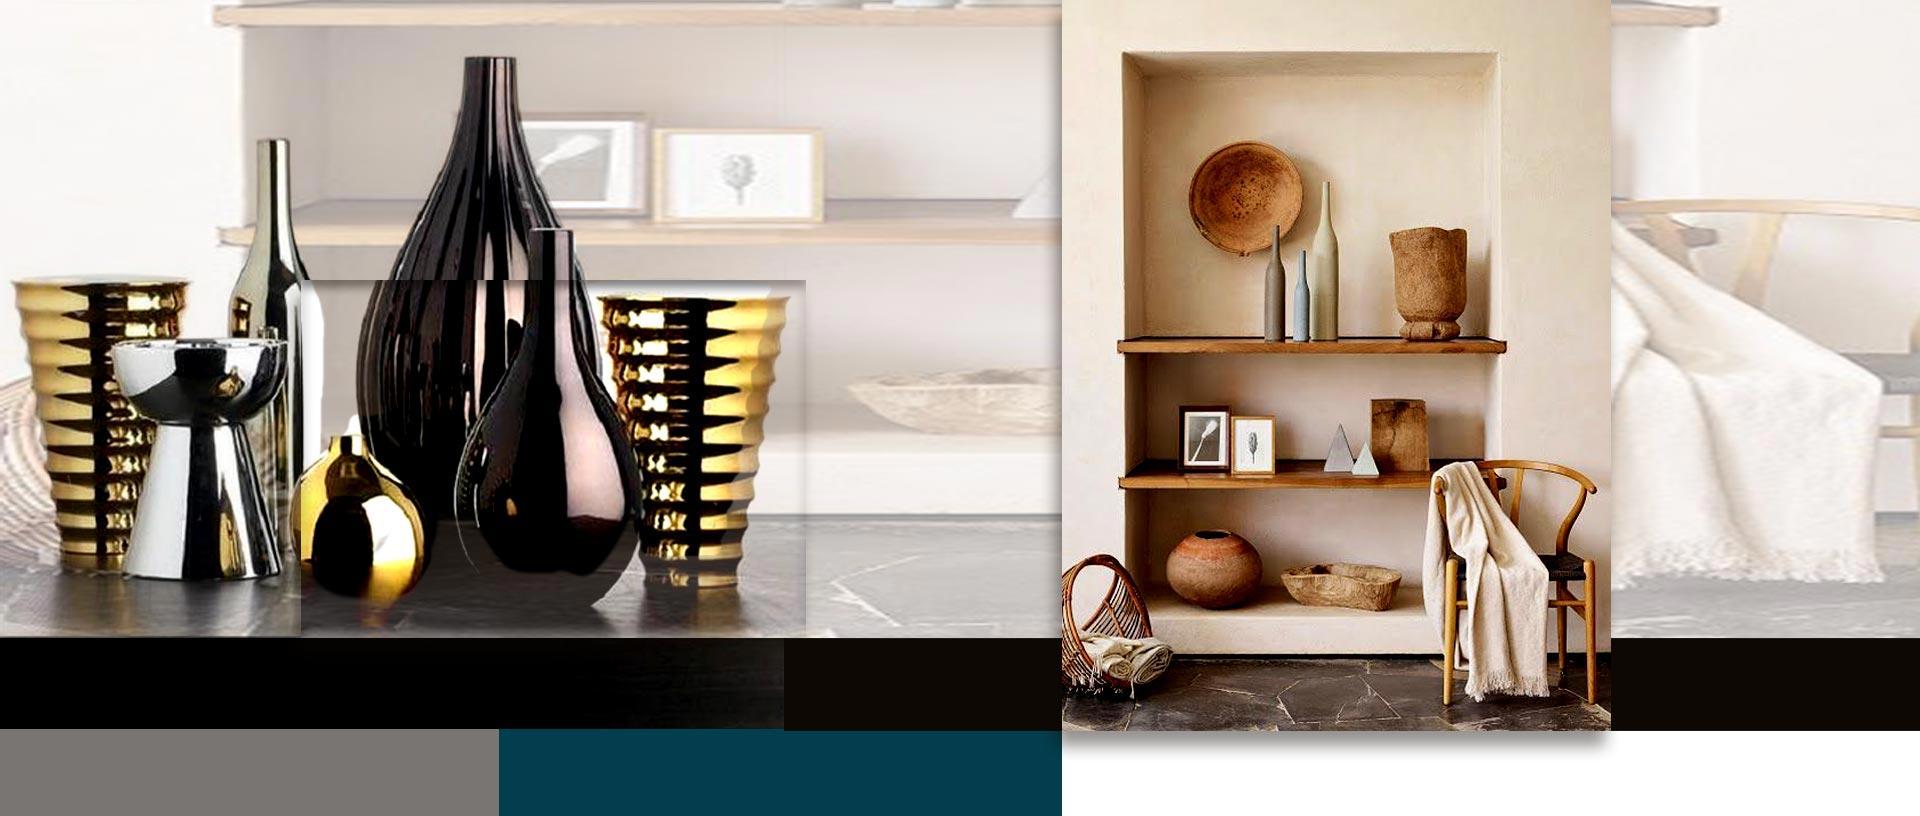 What are decorative  accessories a2 - لوازم دکوری چه چیزهایی هستند؟